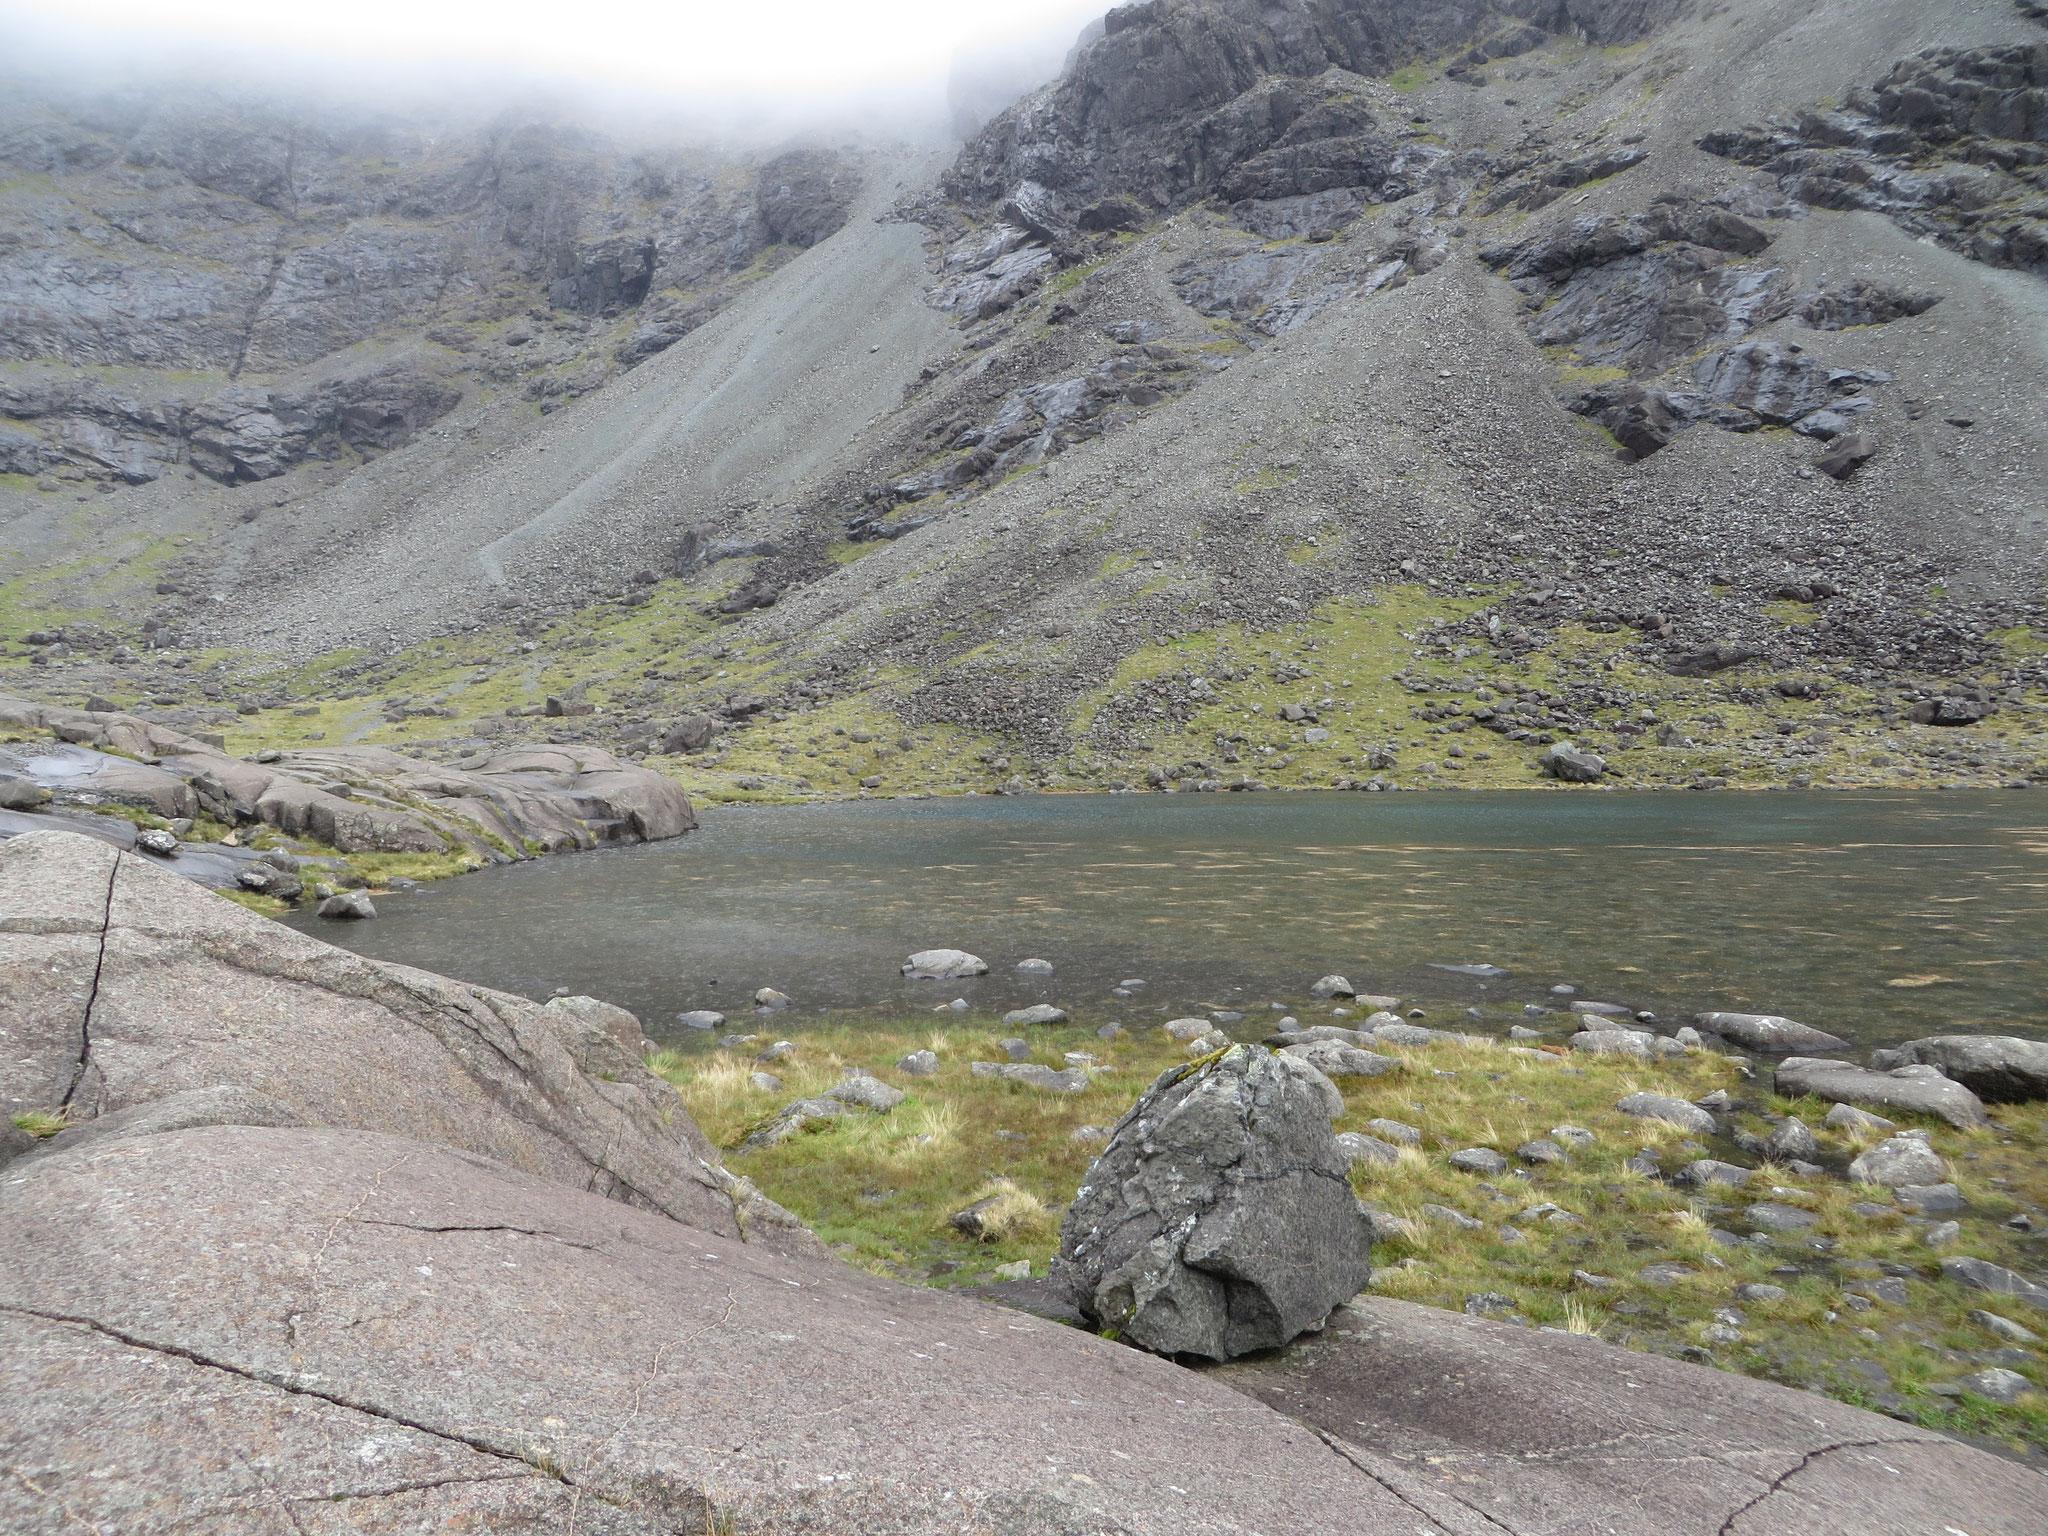 Bergsee in den Cuillins - Augenblicke später schon vom Nebel verschluckt (SCO 2018)